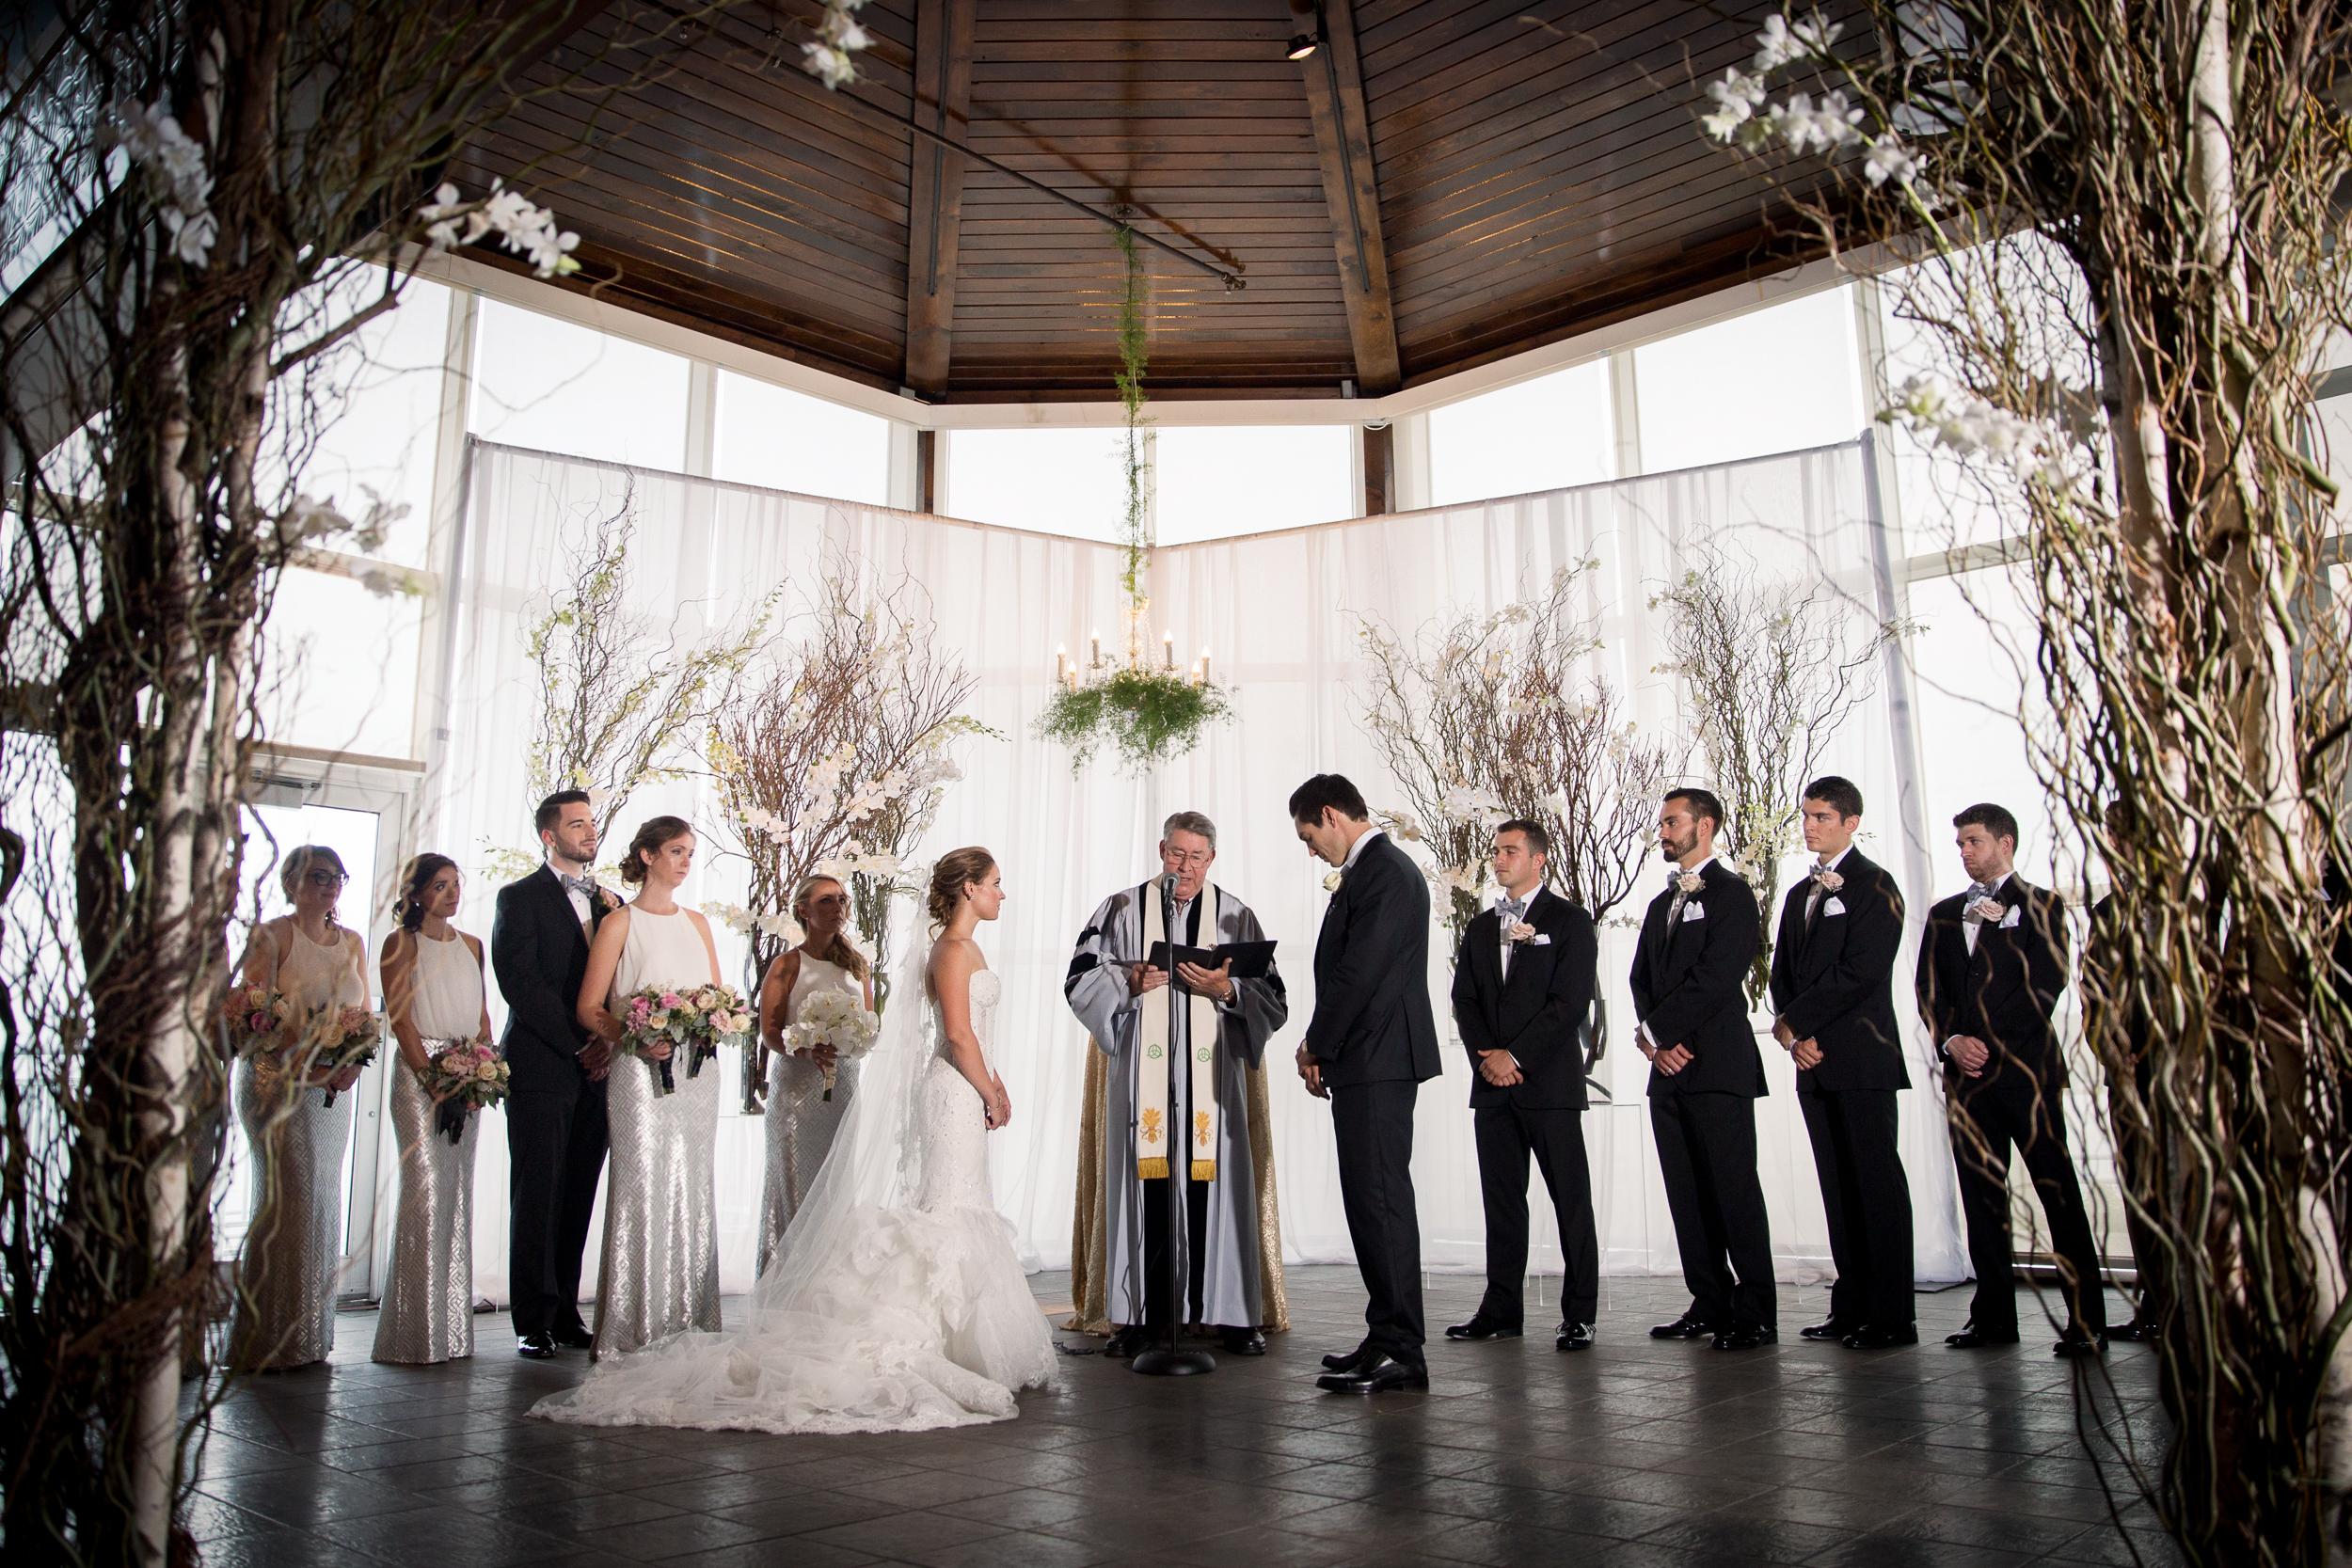 Ceci_New_York_Style_Luxury_Custom_Summer_Wedding_CeciBride_Letterpress_NewYork_Foil_Lighthouse_Chelsea_Piers_53.jpg